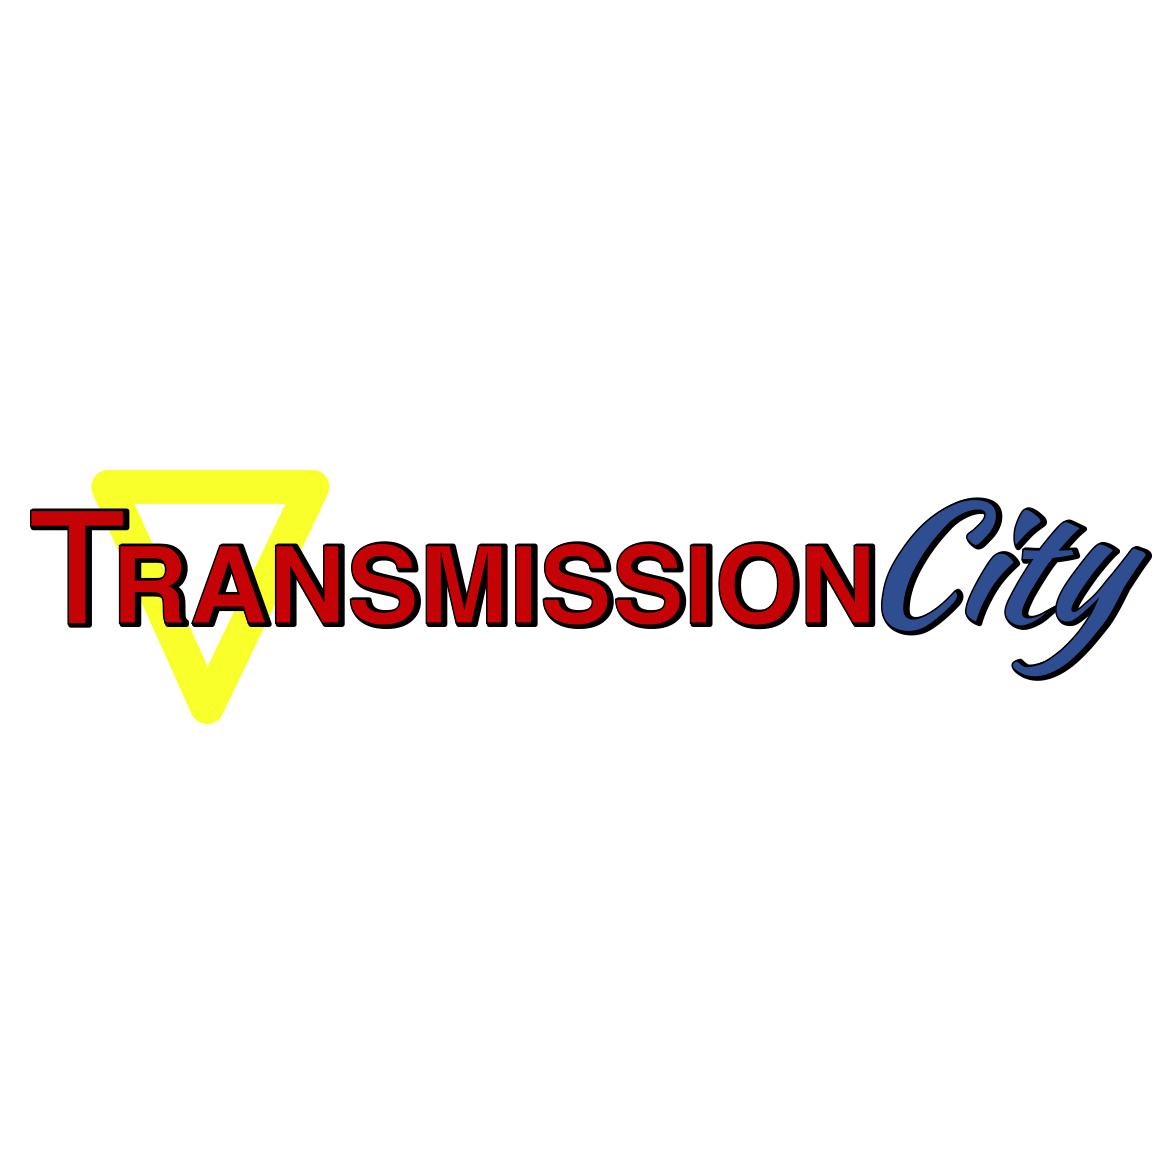 Transmission City - Sandy, UT 84070 - (801)565-9990 | ShowMeLocal.com